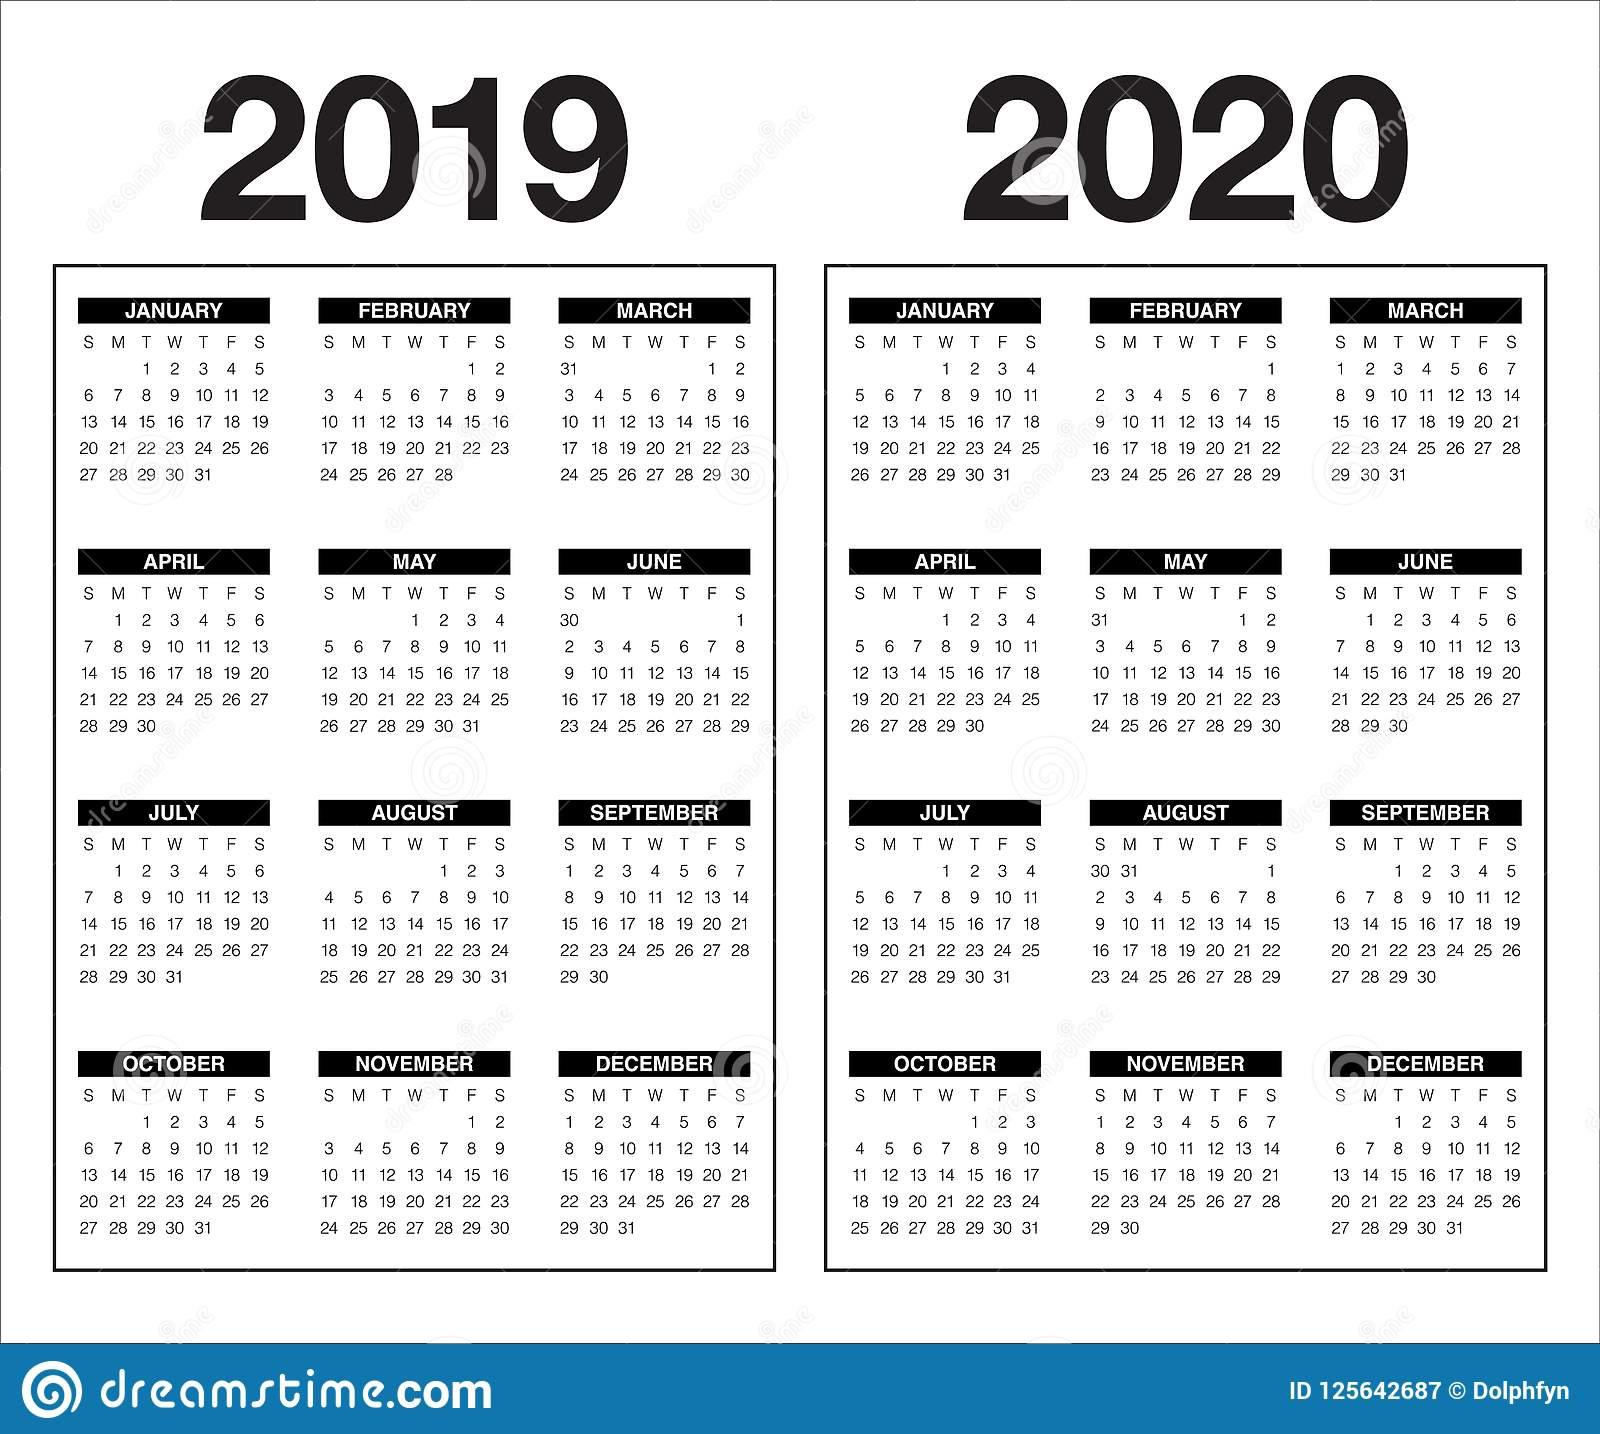 Year 2019 2020 Calendar Vector Design Template Stock Vector inside 2019/2020 Calander To Write On